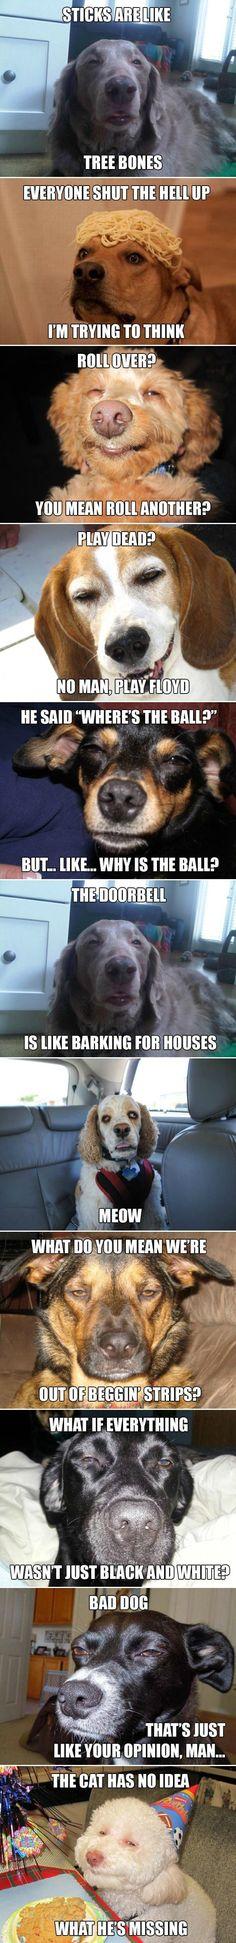 Smol Doggo Dump #funnydoglaughter